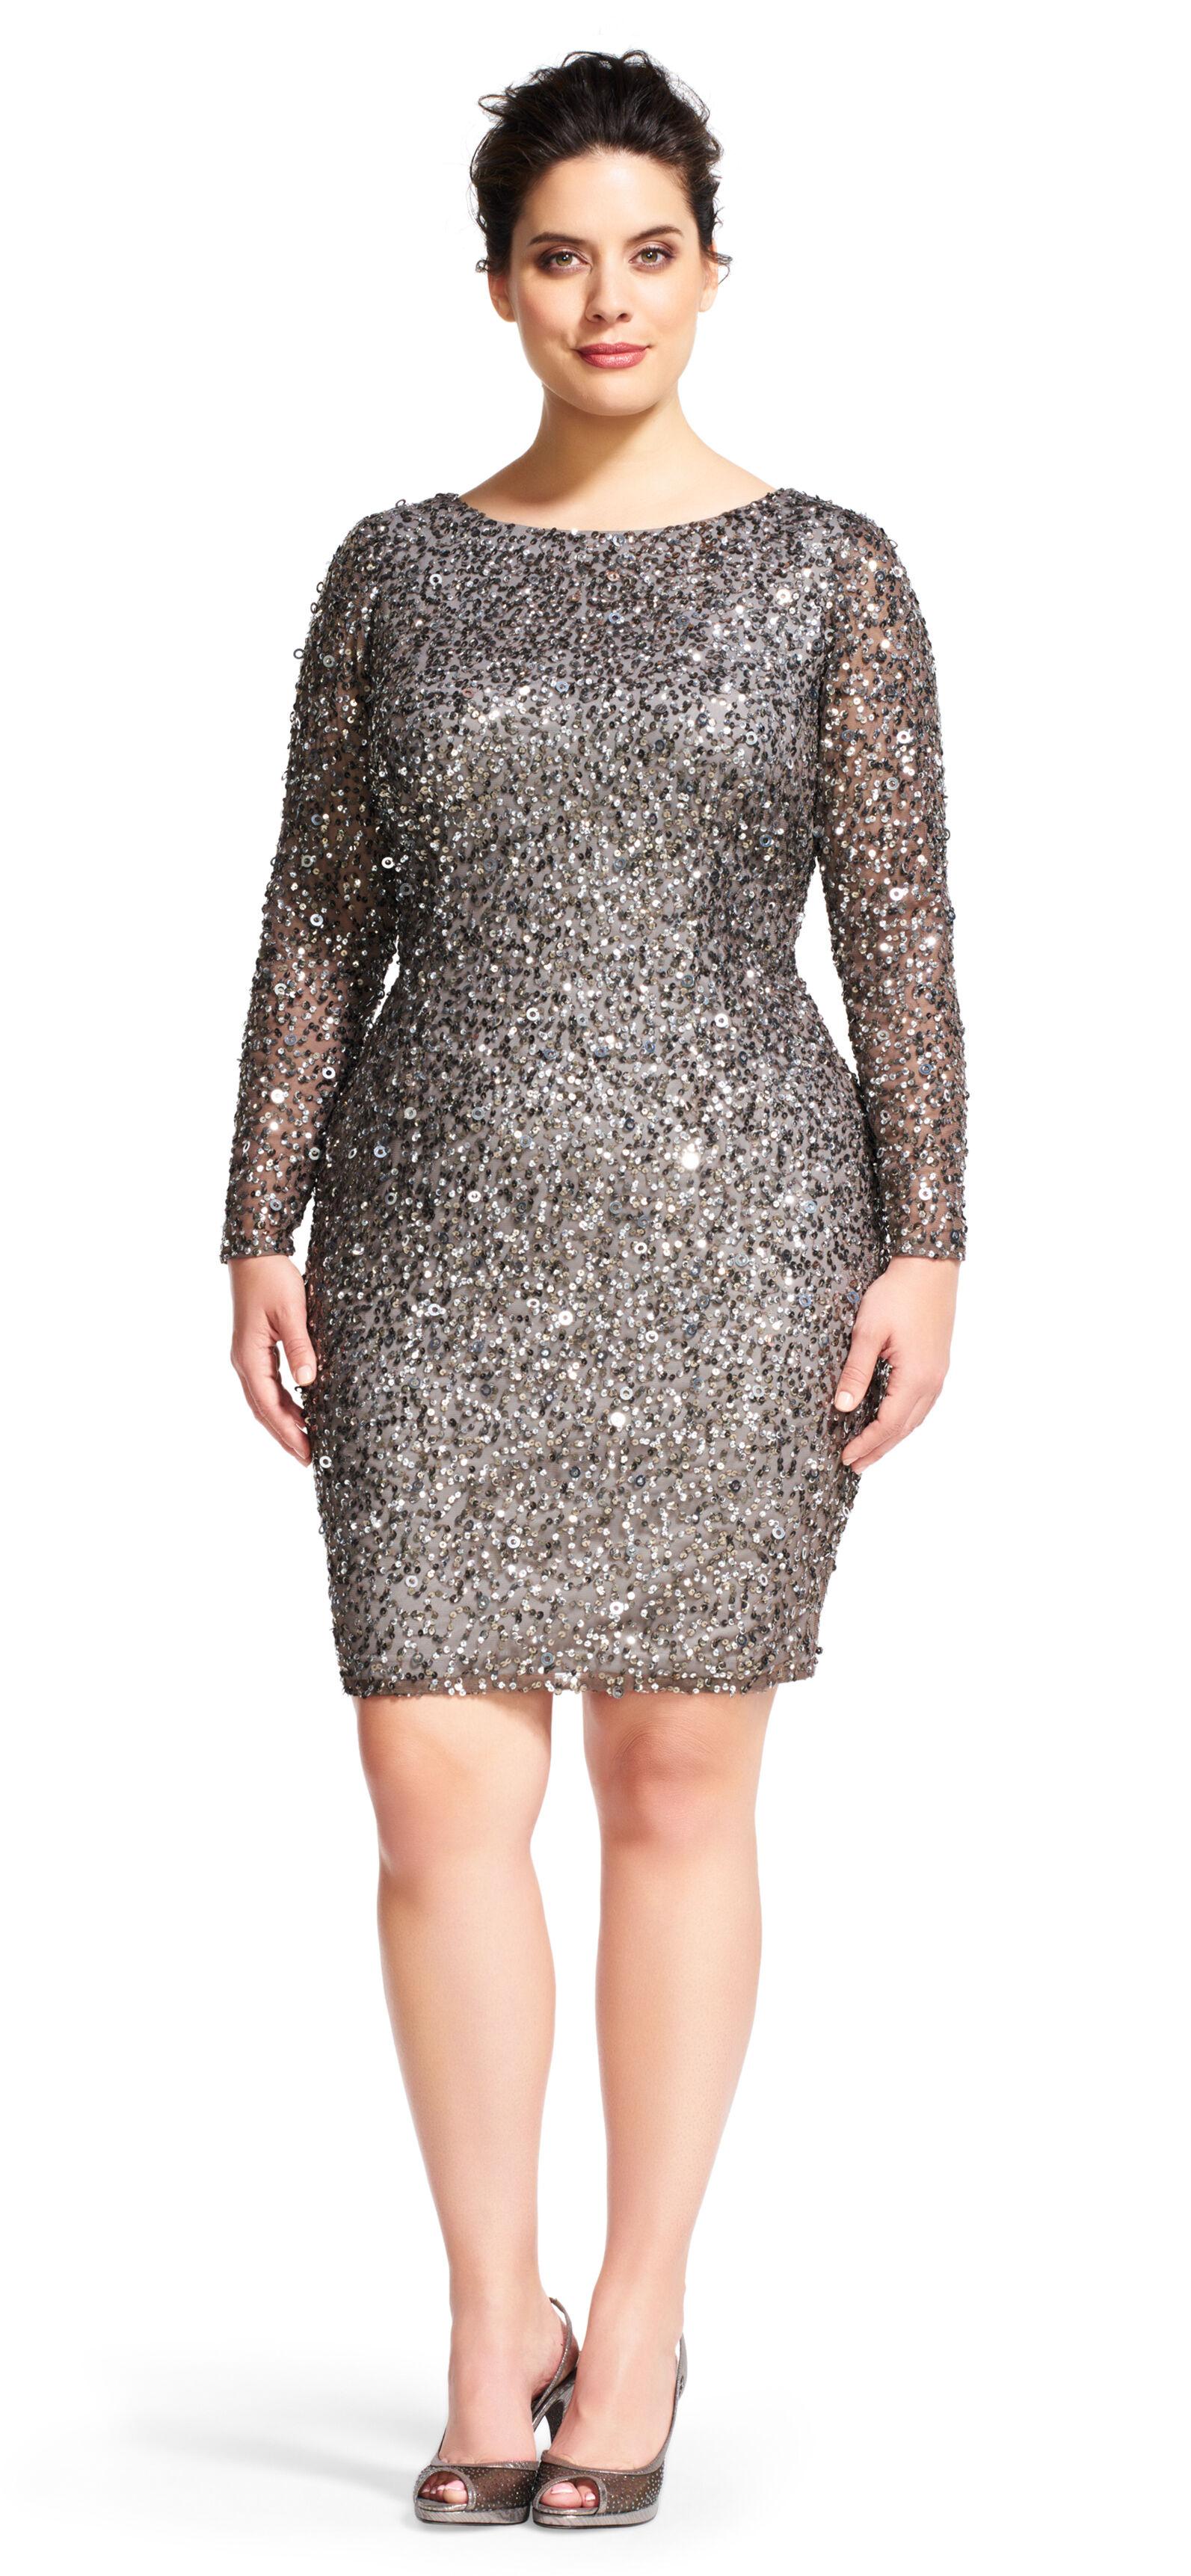 Evening dresses plus sizes toronto